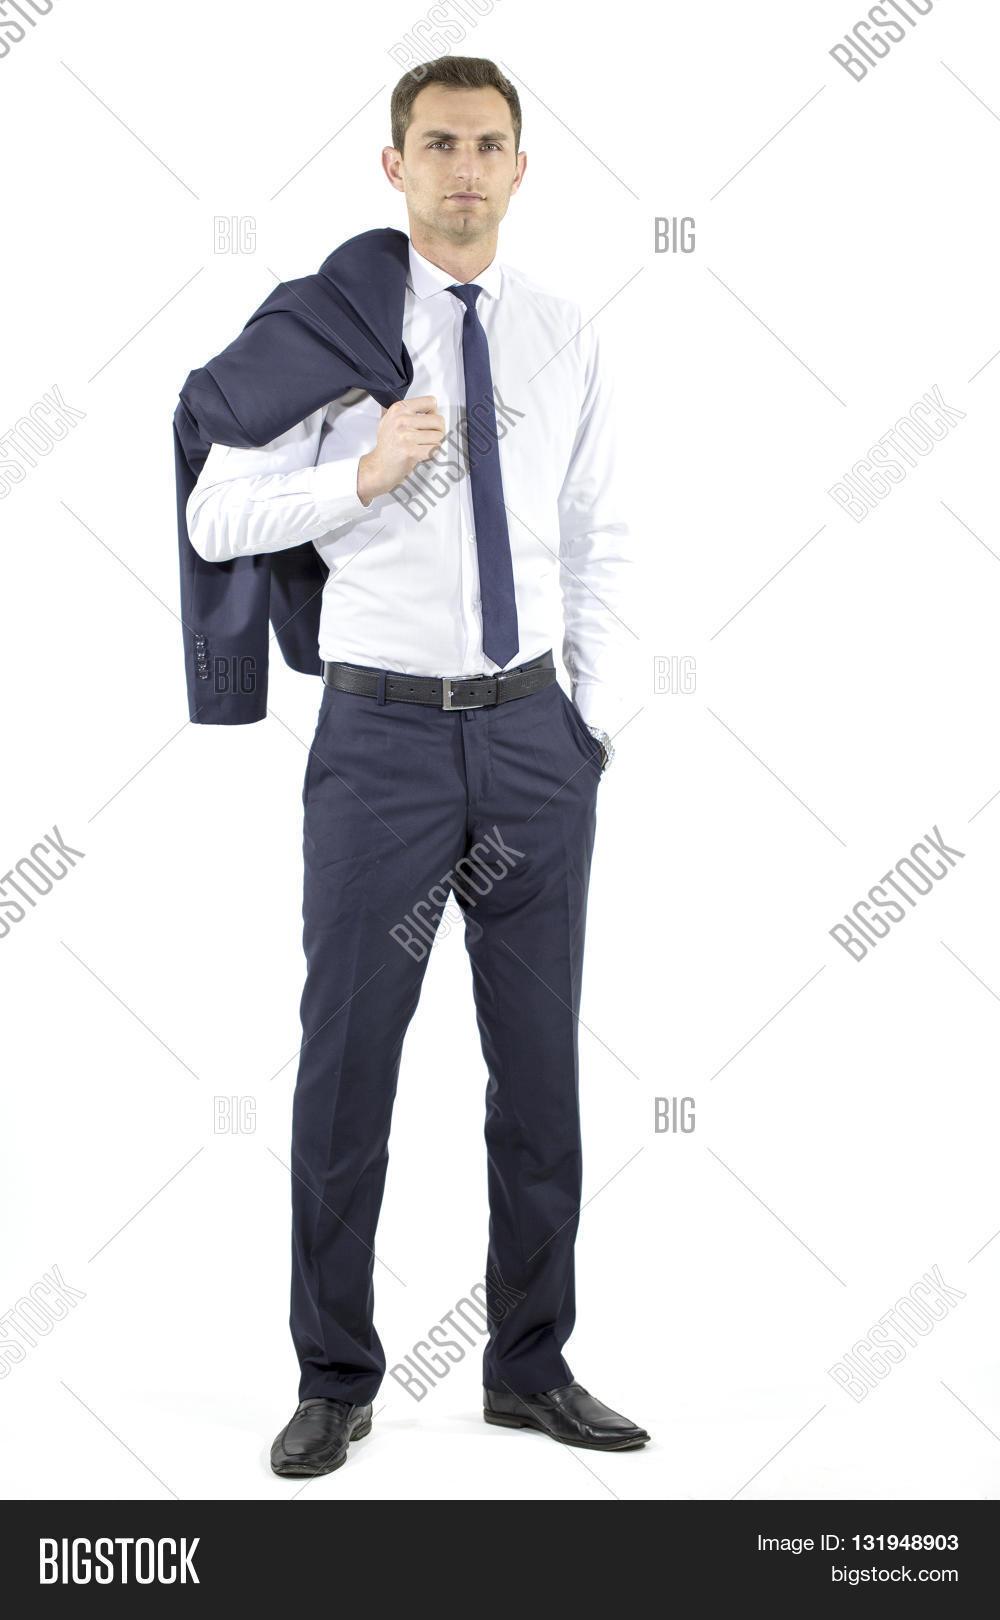 3503152c23 handsome Hispanic elegant man in black suit on grey background, holding the  coat over his